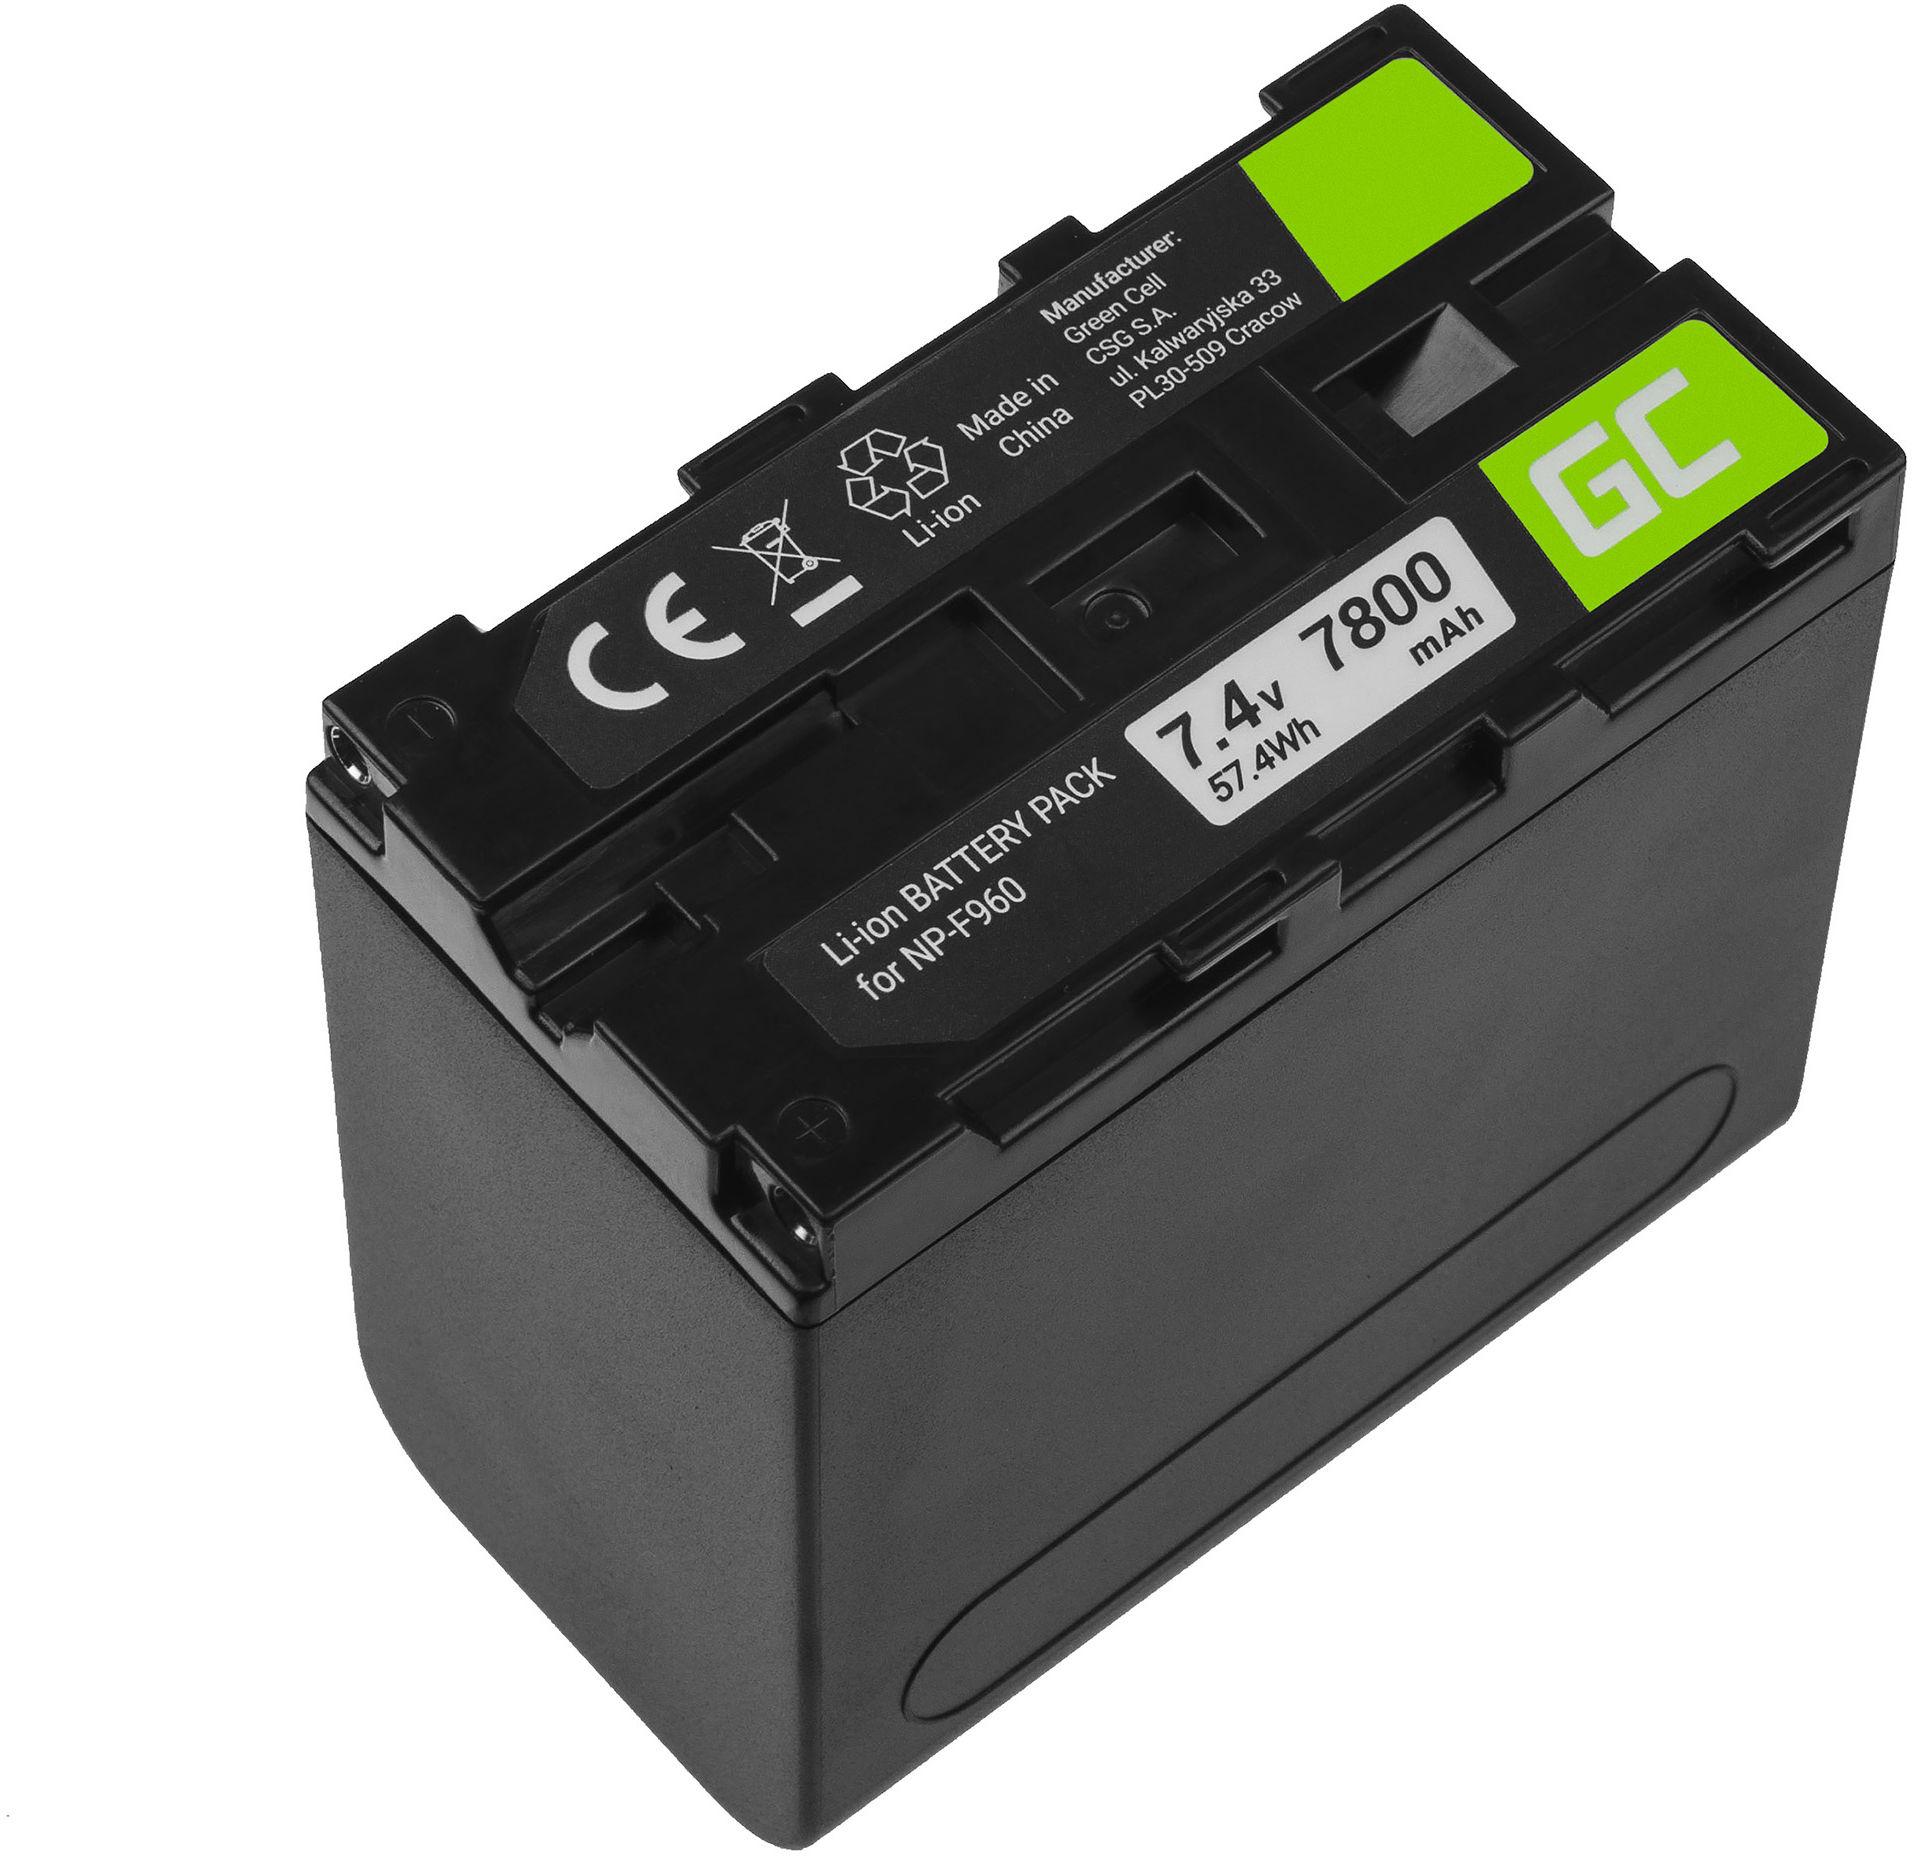 Akumulator Bateria Green Cell NP-F960 NP-F970 NP-F975 do Sony 7.4V 7800mAh